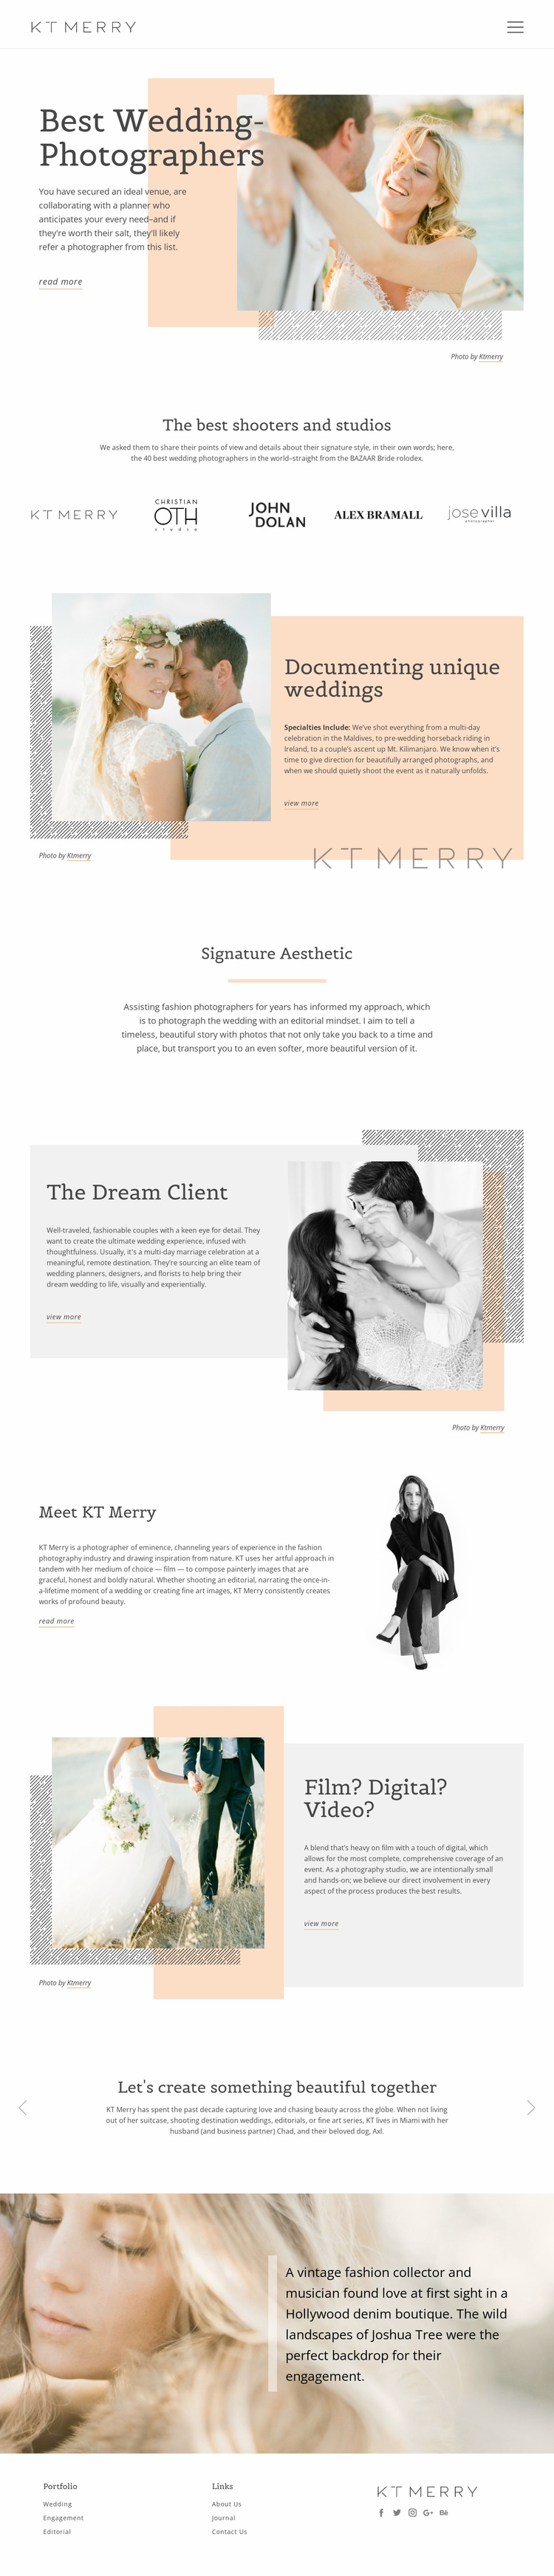 Wedding Photographers Website Template